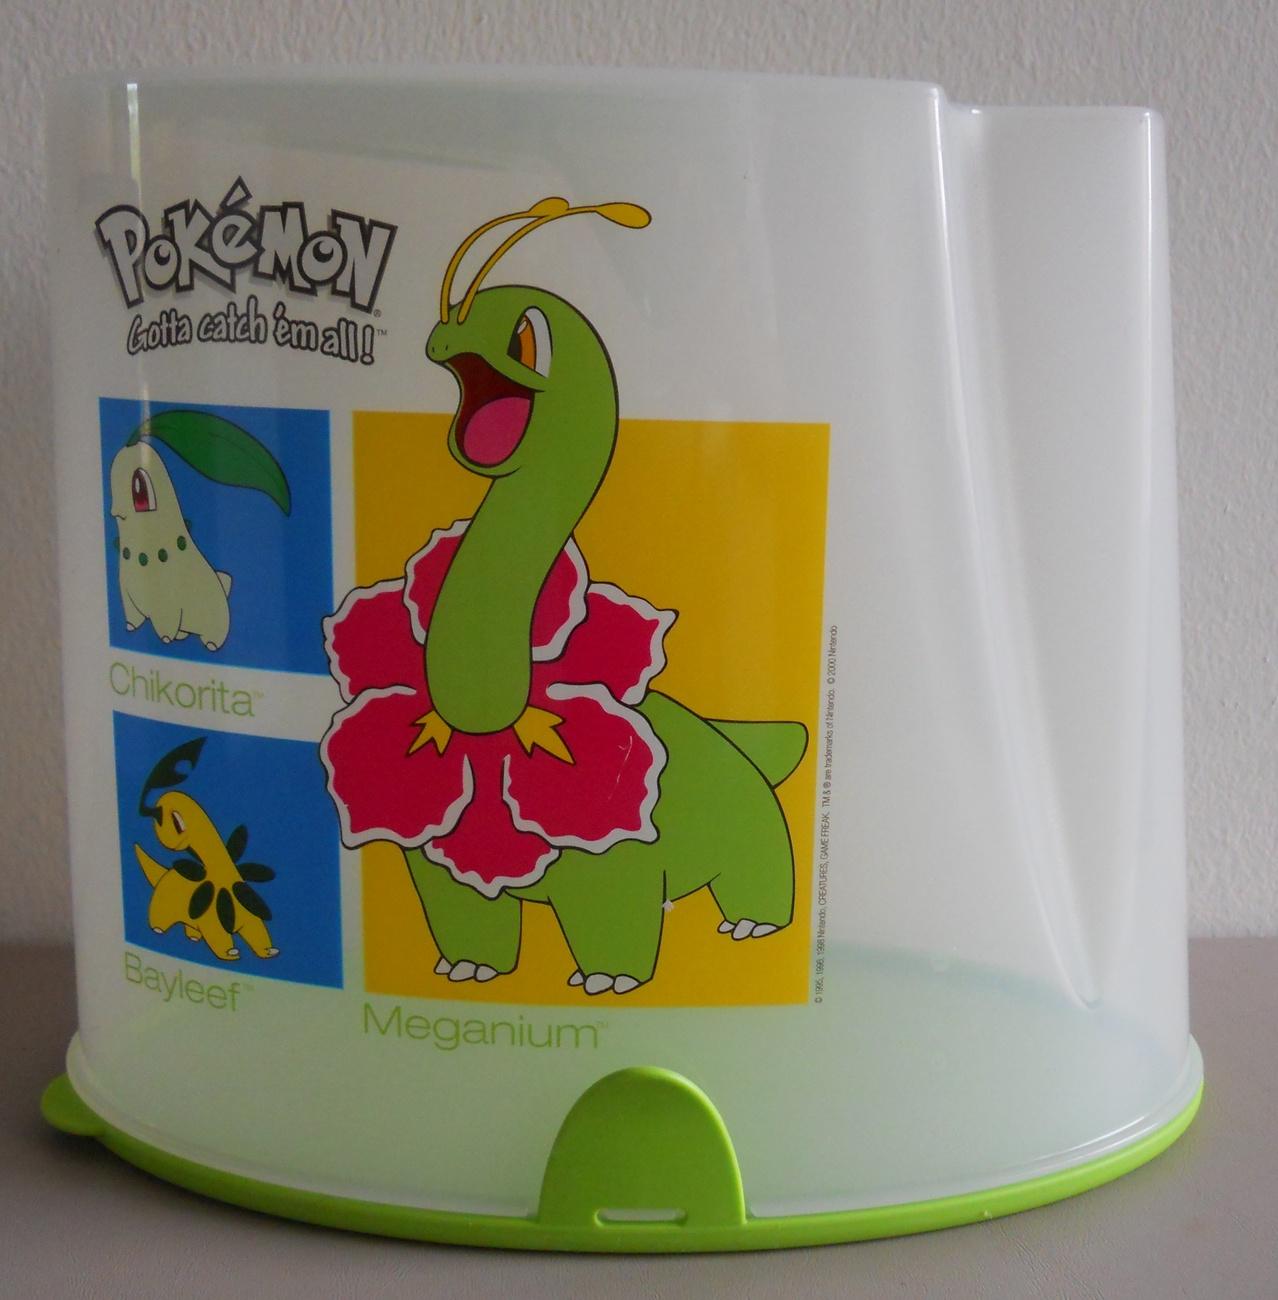 Retired_pokemon_tupperware_cereal_keeper_pantry_meganium_bayleef_chikorita